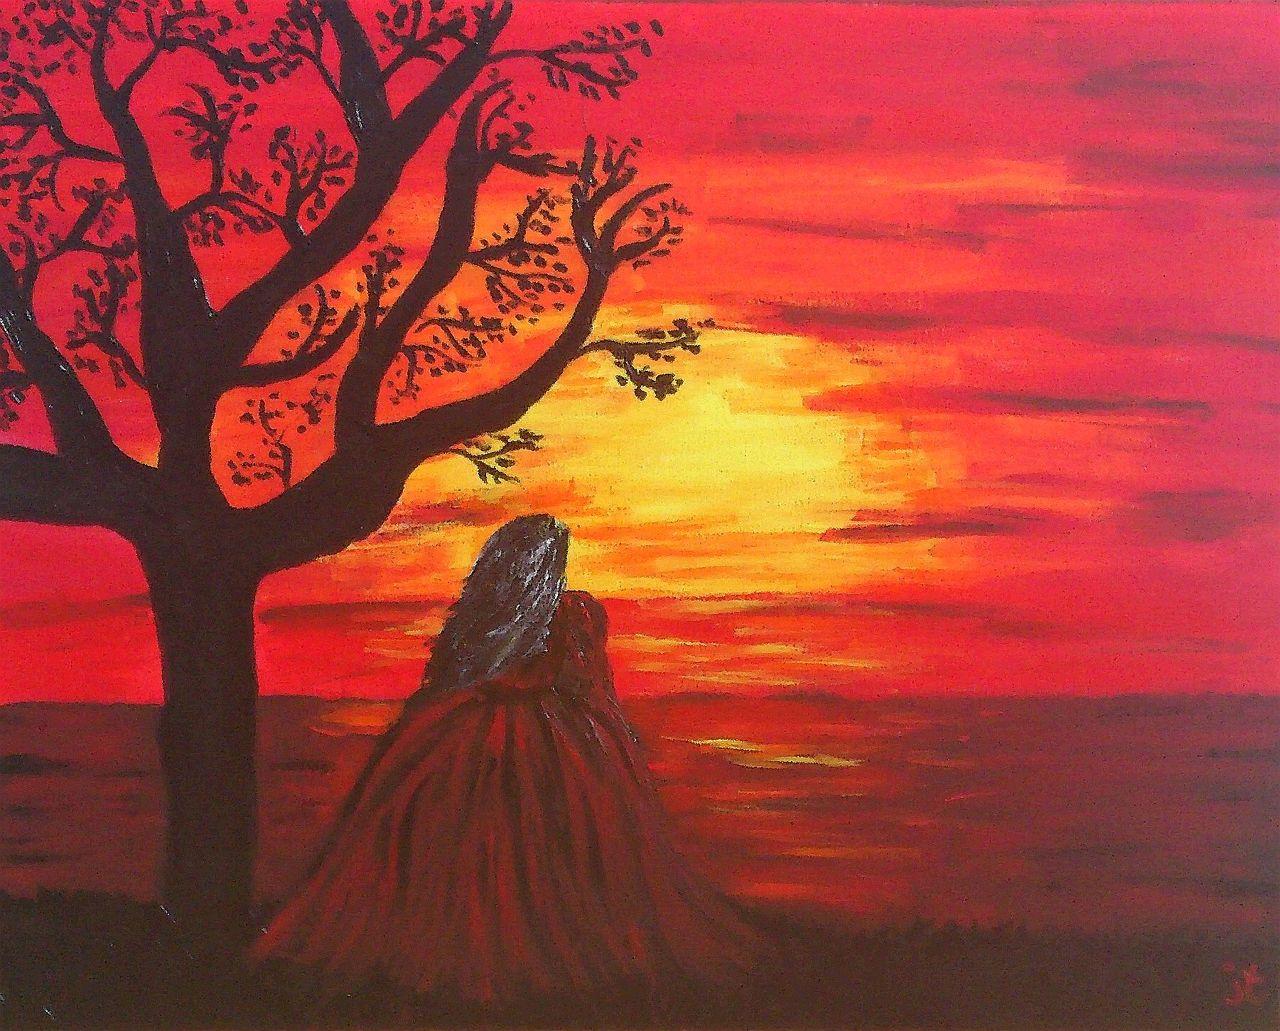 romantic woman meer romantisch romantik sonnenuntergang von janine thoms bei kunstnet. Black Bedroom Furniture Sets. Home Design Ideas